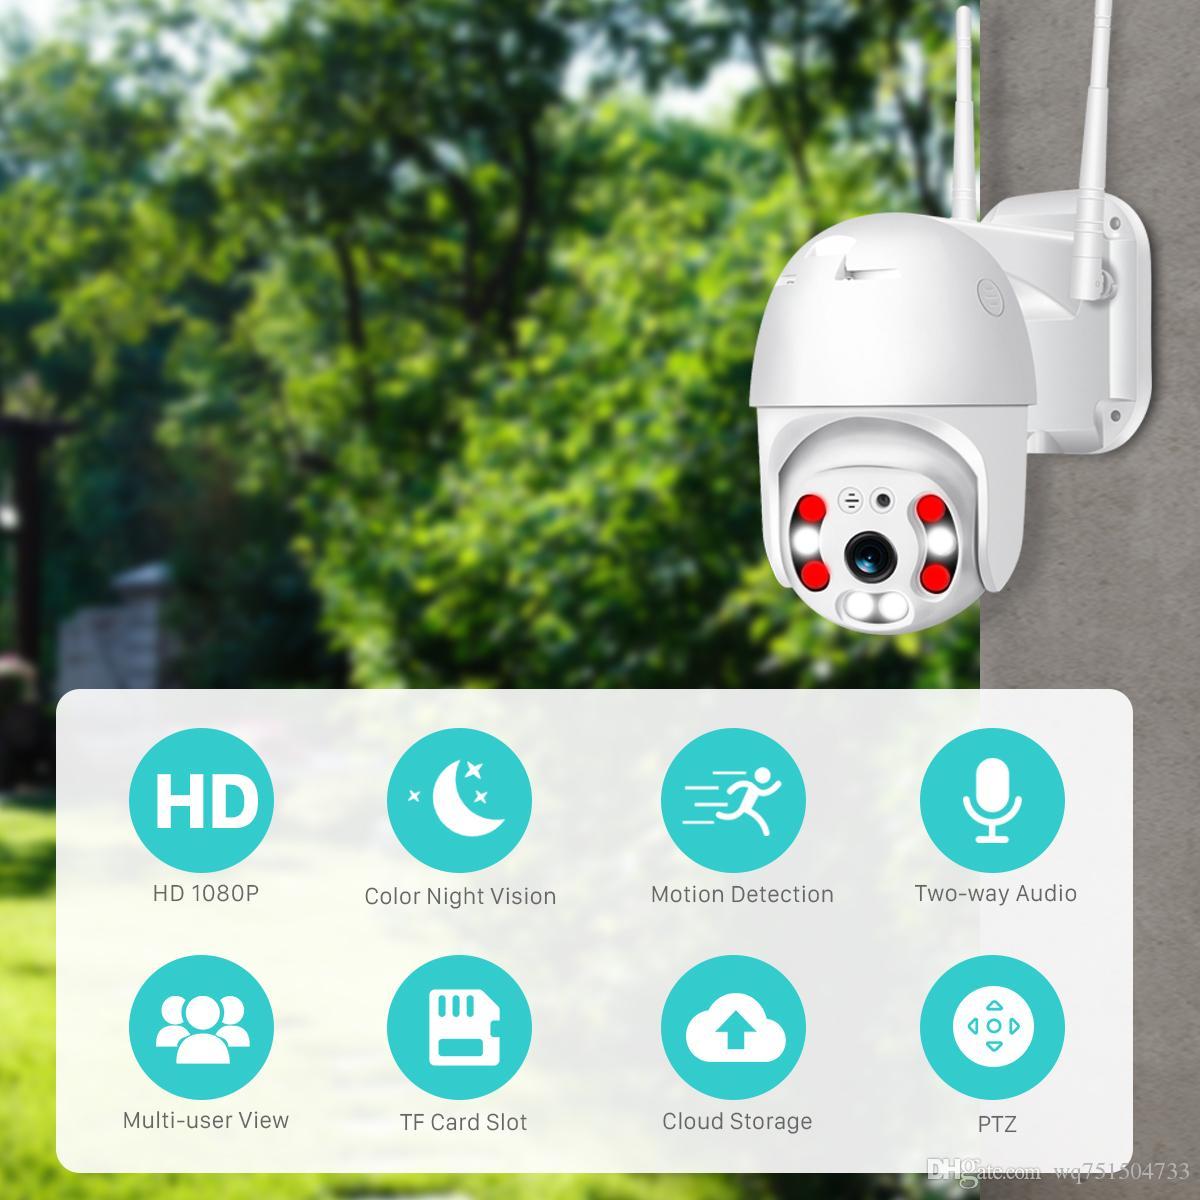 4G 1080P 야외 스피드 돔 와이파이 카메라 IP 2MP H.26 오디오 PTZ 무선 카메라 아이 클라우드 SD 슬롯 ONVIF 감시 IP 카메라